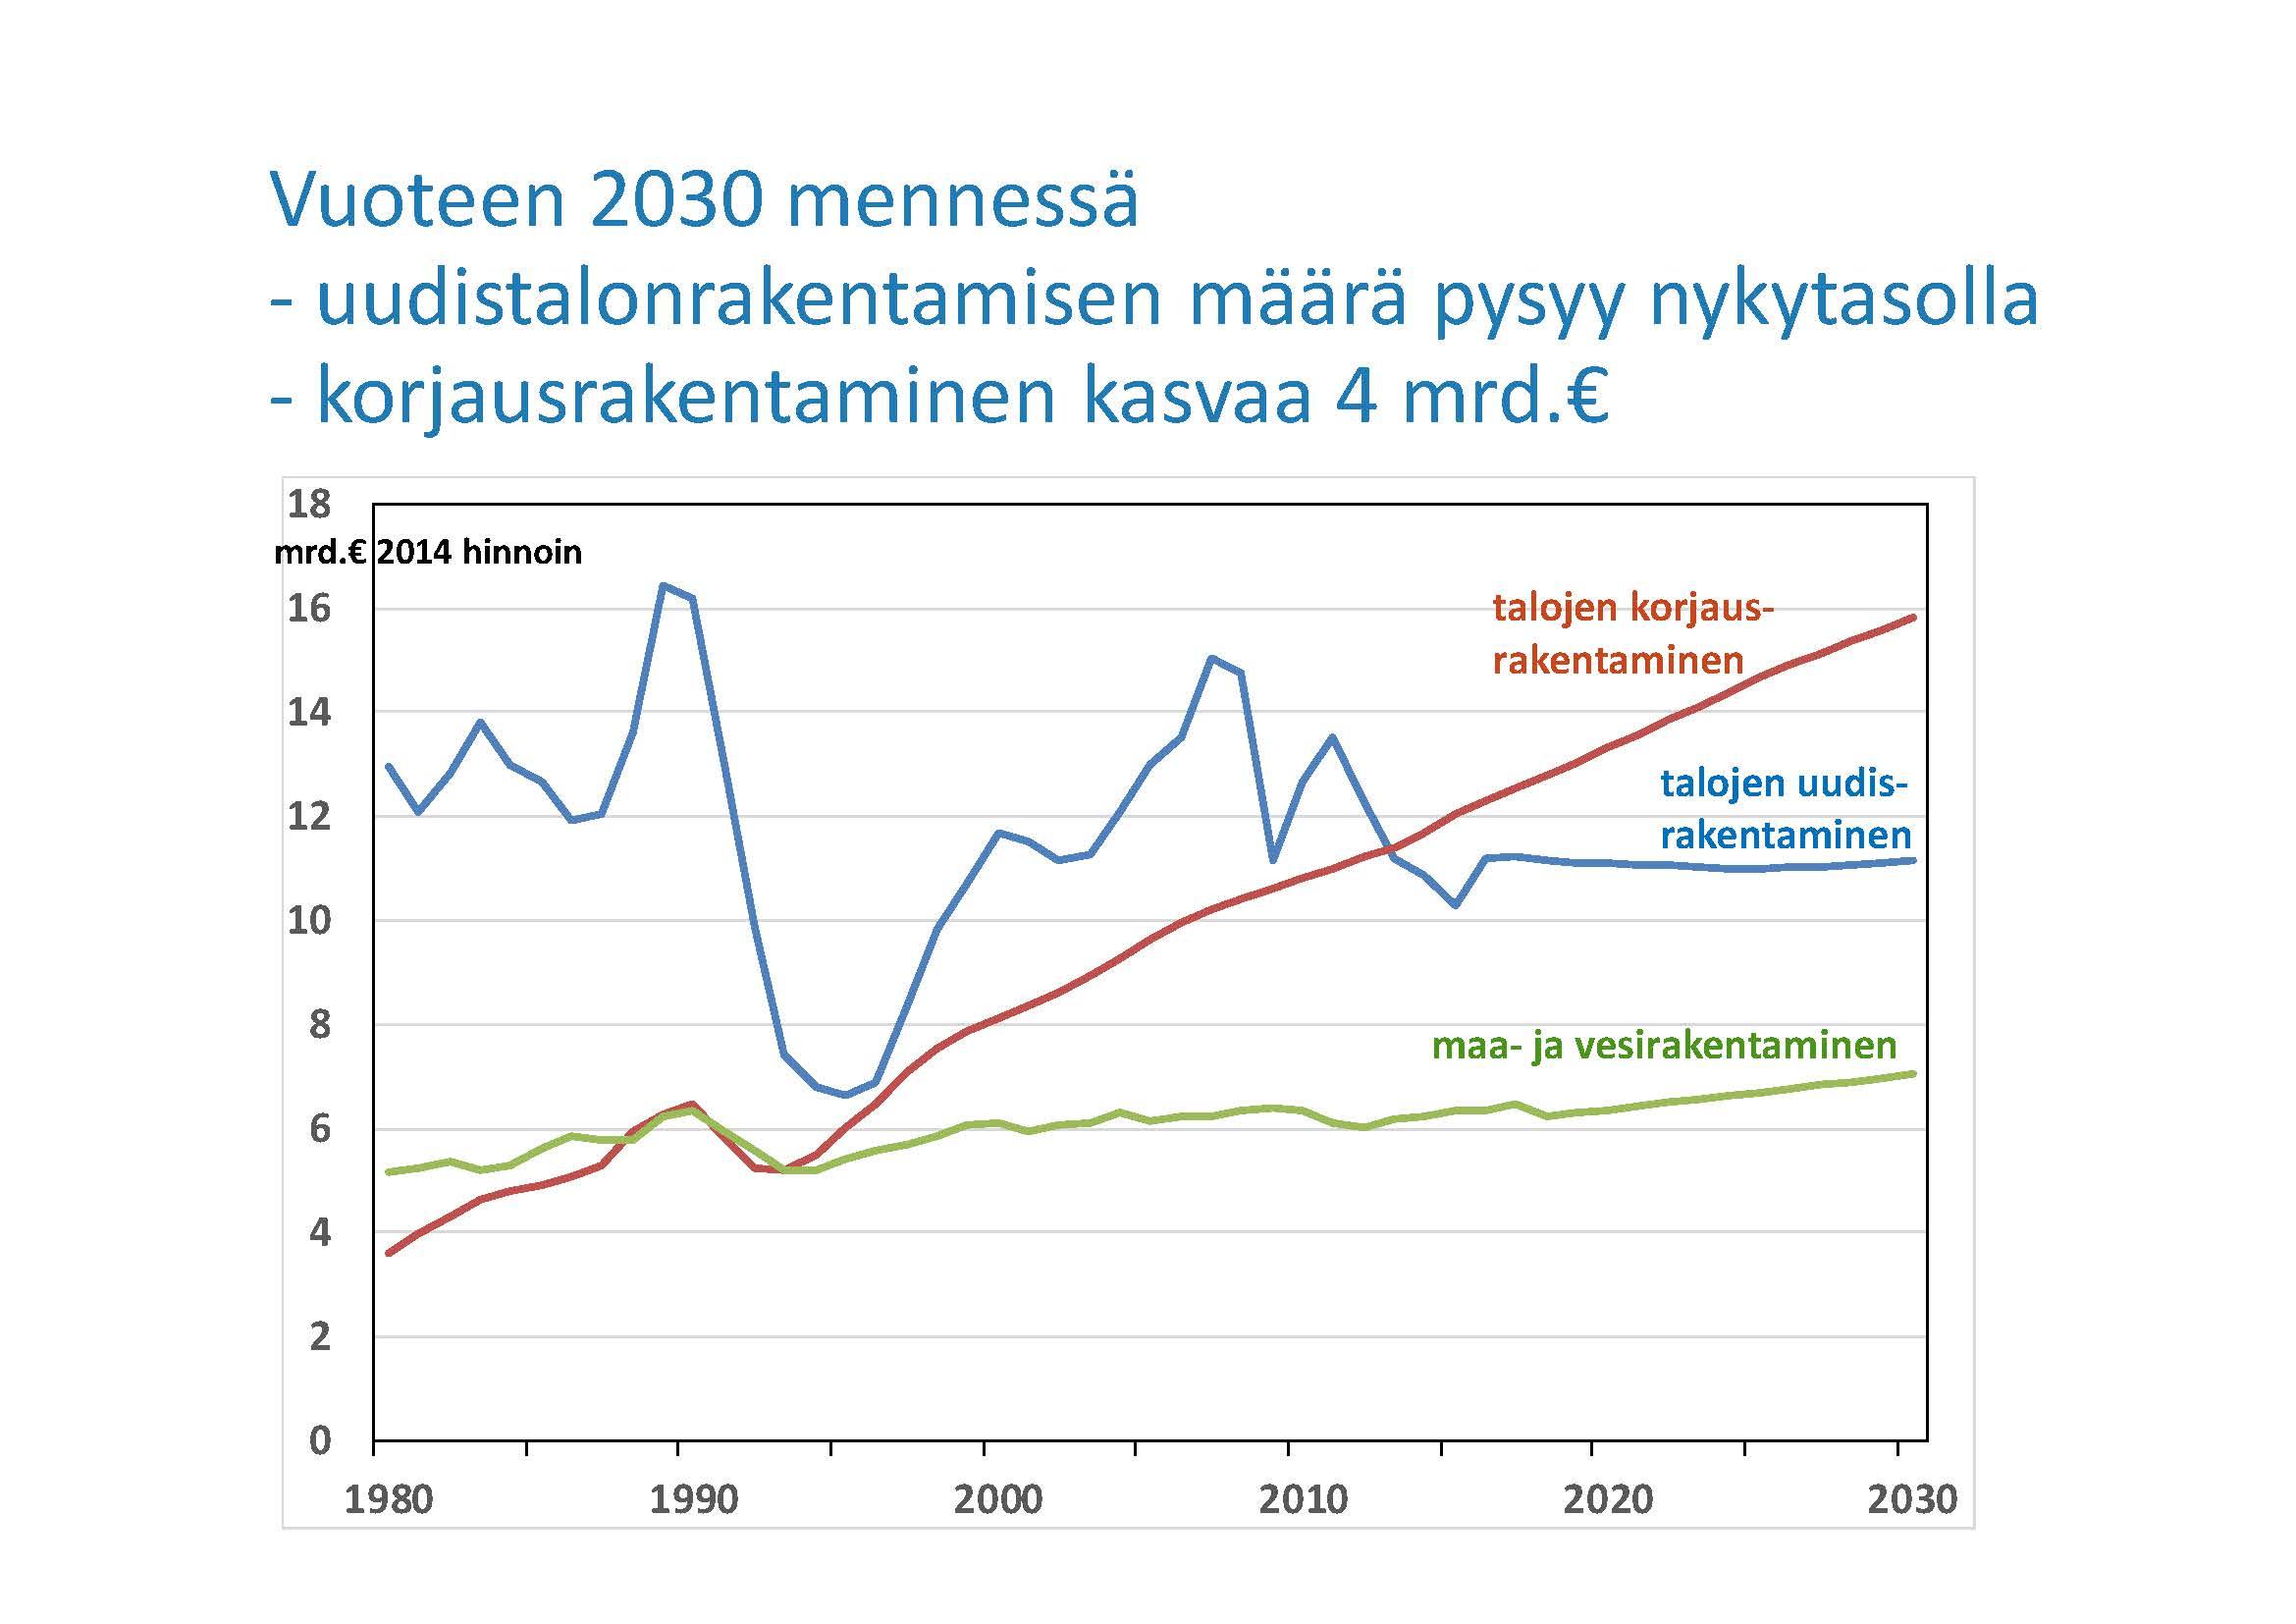 Pajakkala Rakennuslehti 50 v numero artikkeli 7.4.2016_Page_15